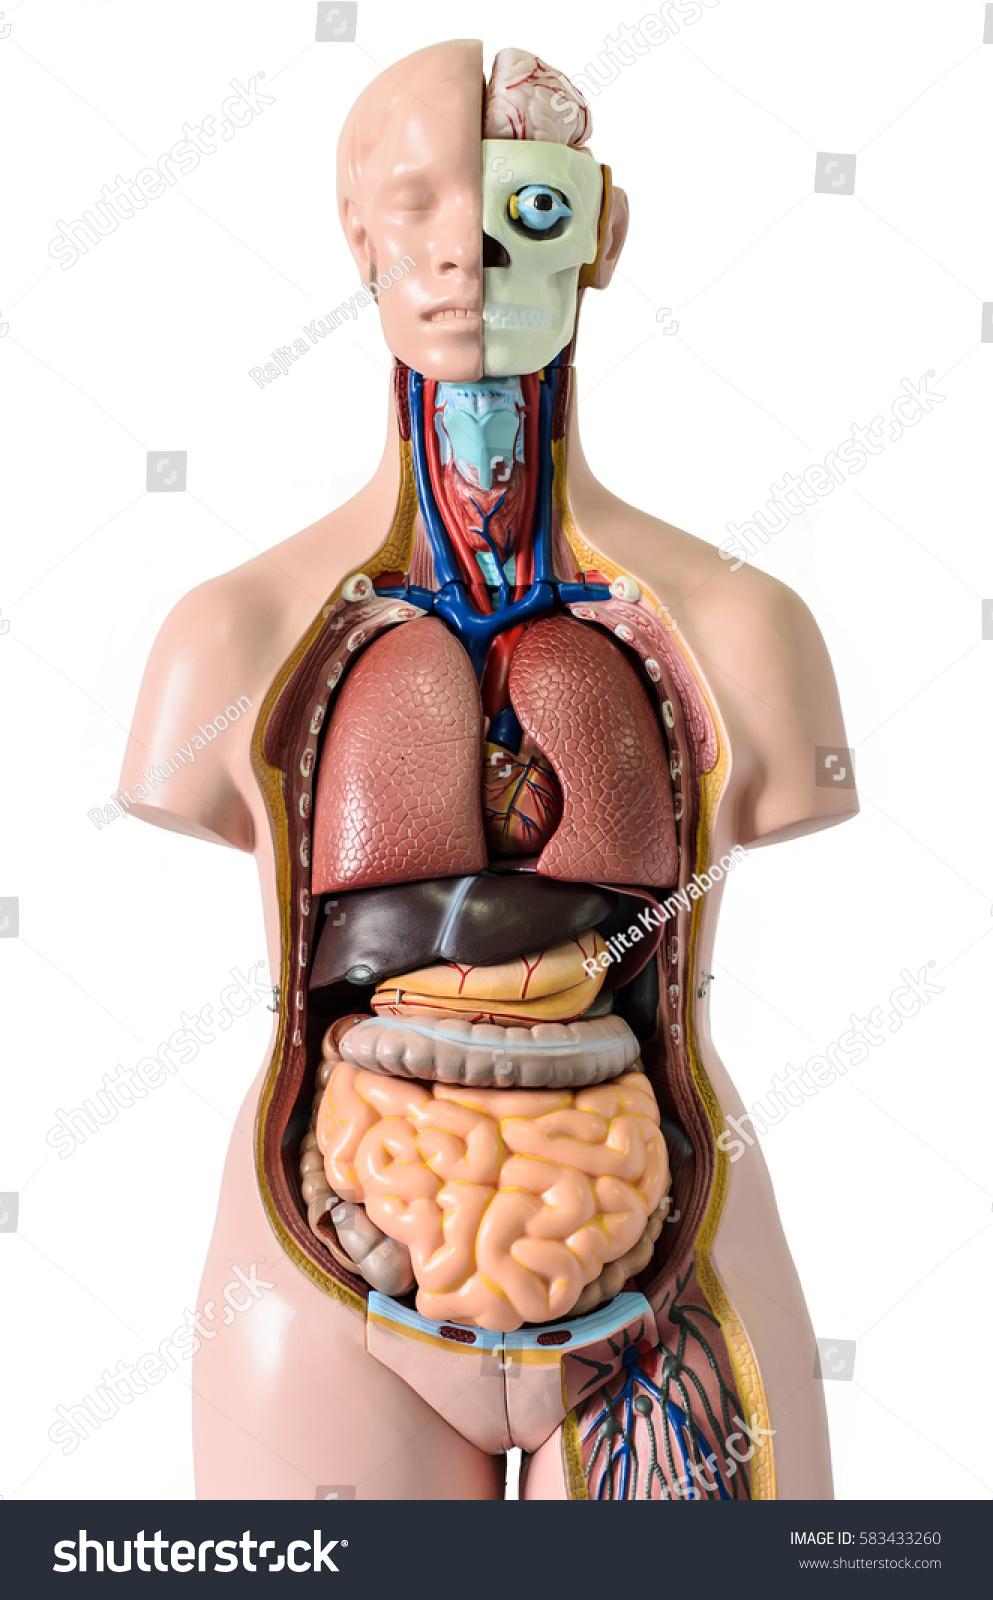 Human Body Anatomy Model Stock Photo (Royalty Free) 583433260 ...